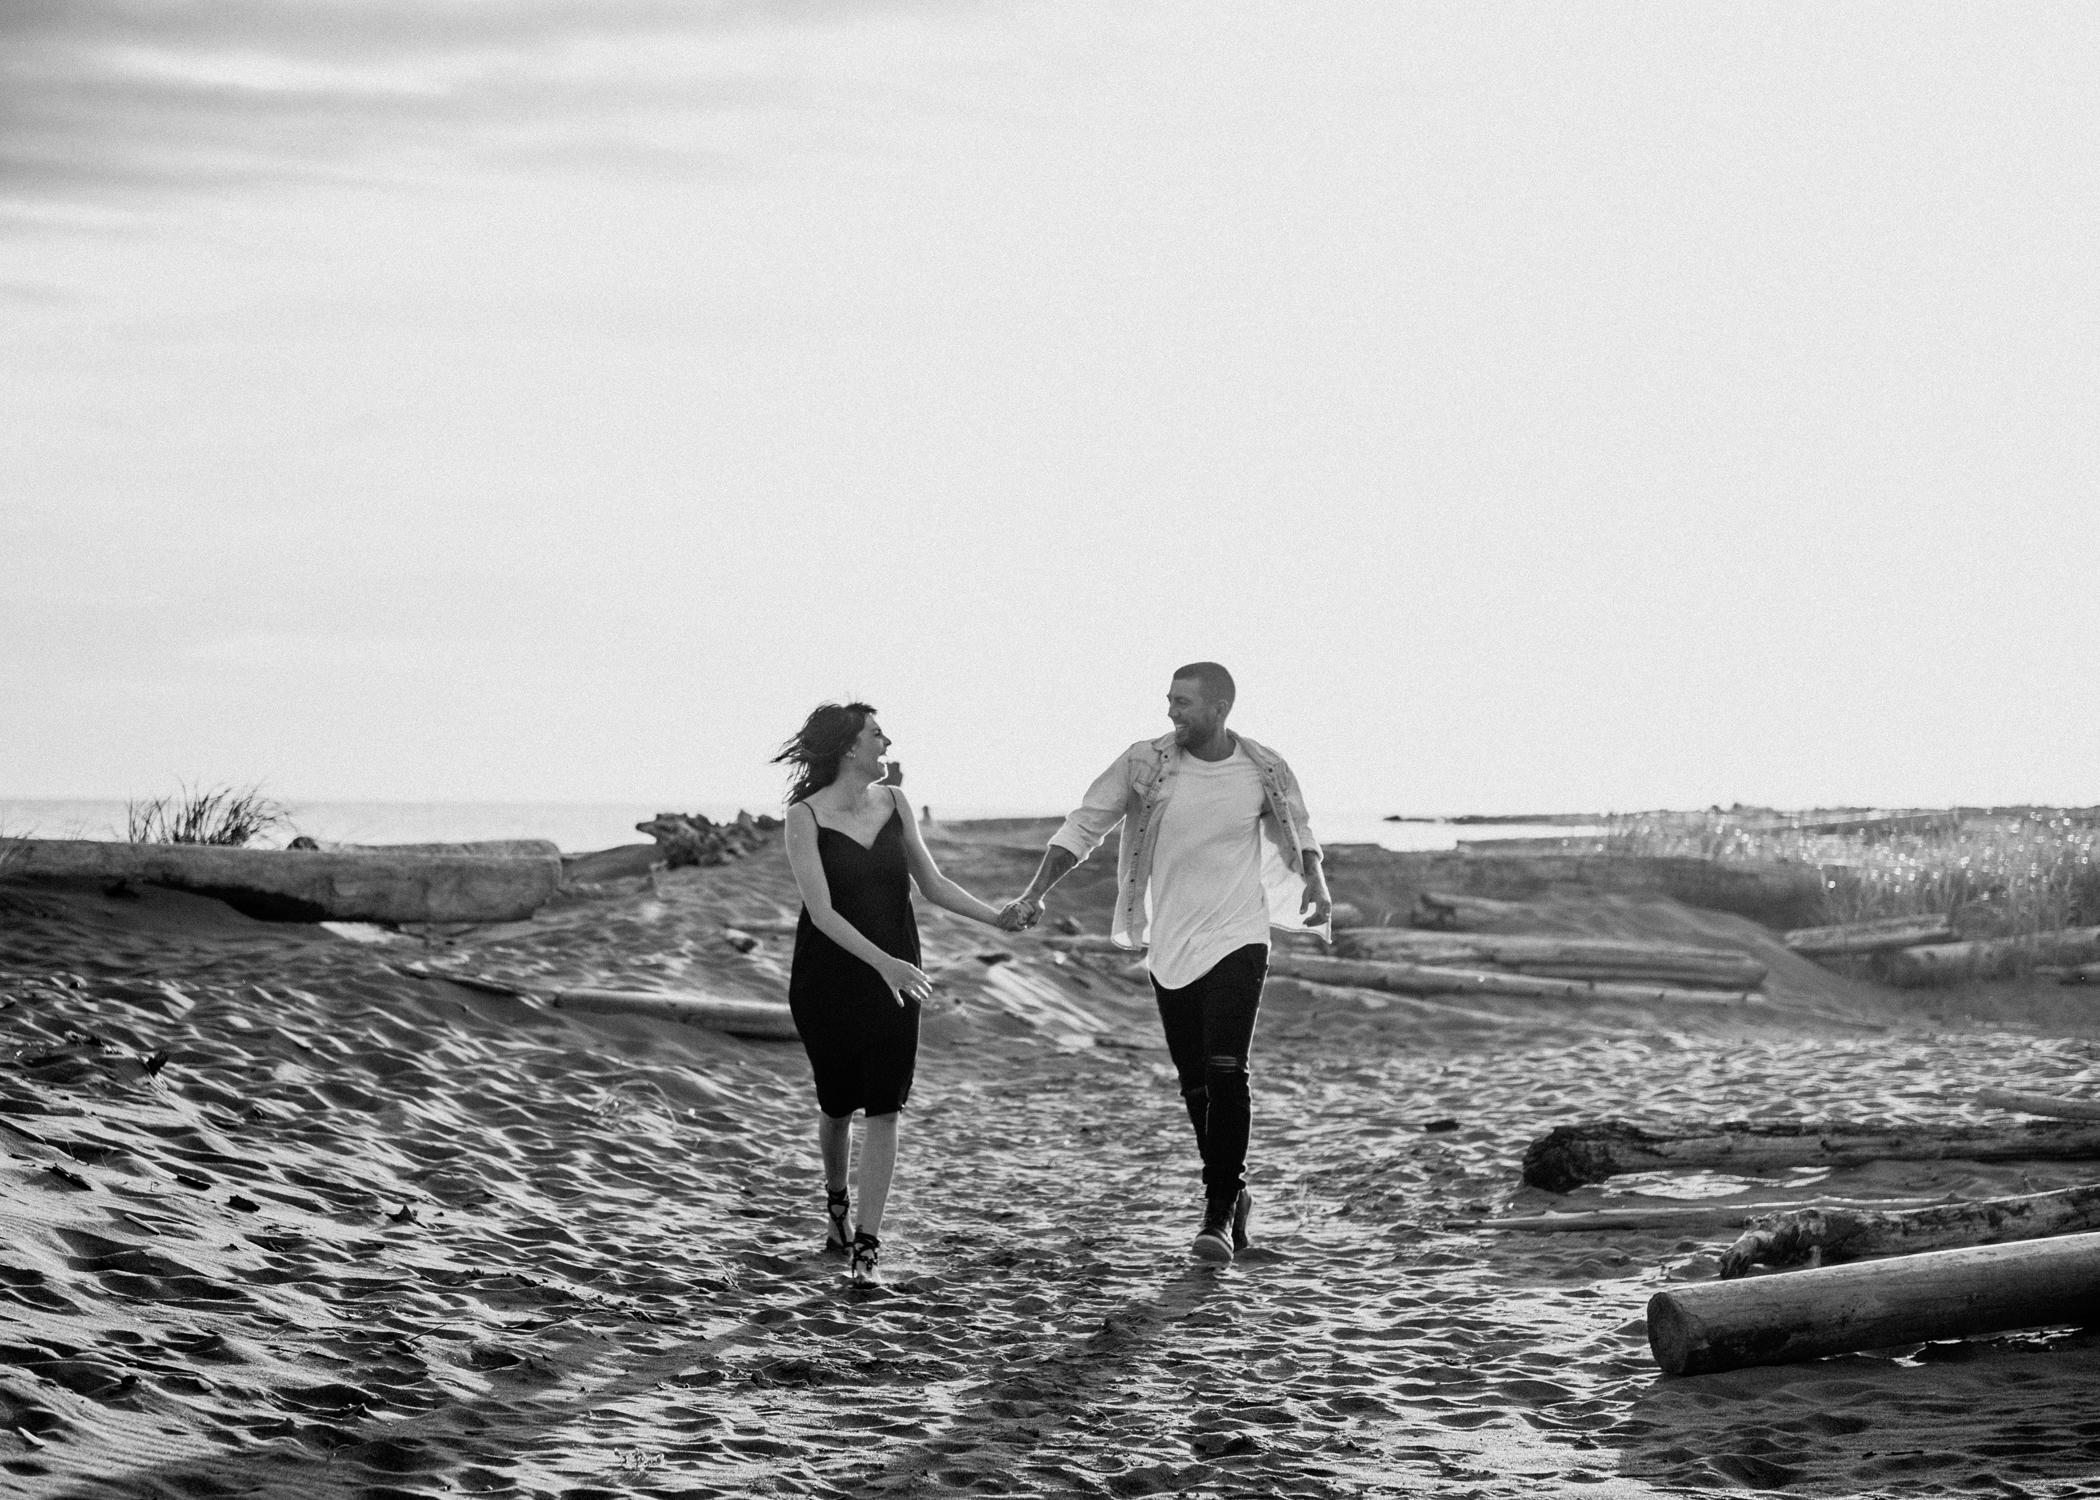 015-kaoverii-silva-lm-prewedding-vancouver-photography-iona-beach-inhome.png